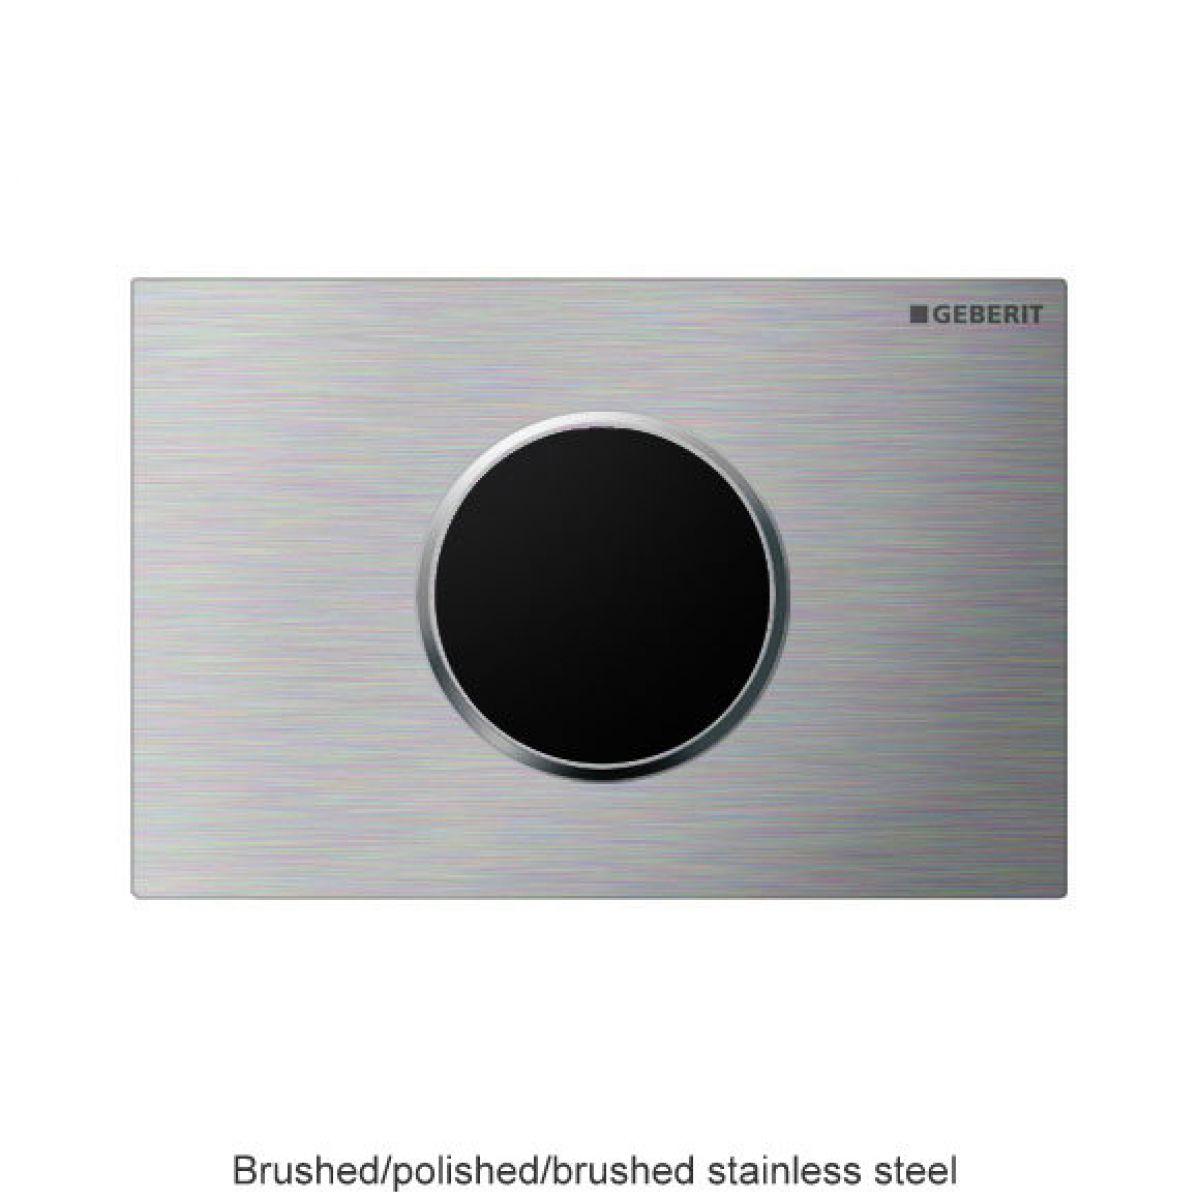 geberit sigma 10 touchless battery powered flush plate uk bathrooms. Black Bedroom Furniture Sets. Home Design Ideas